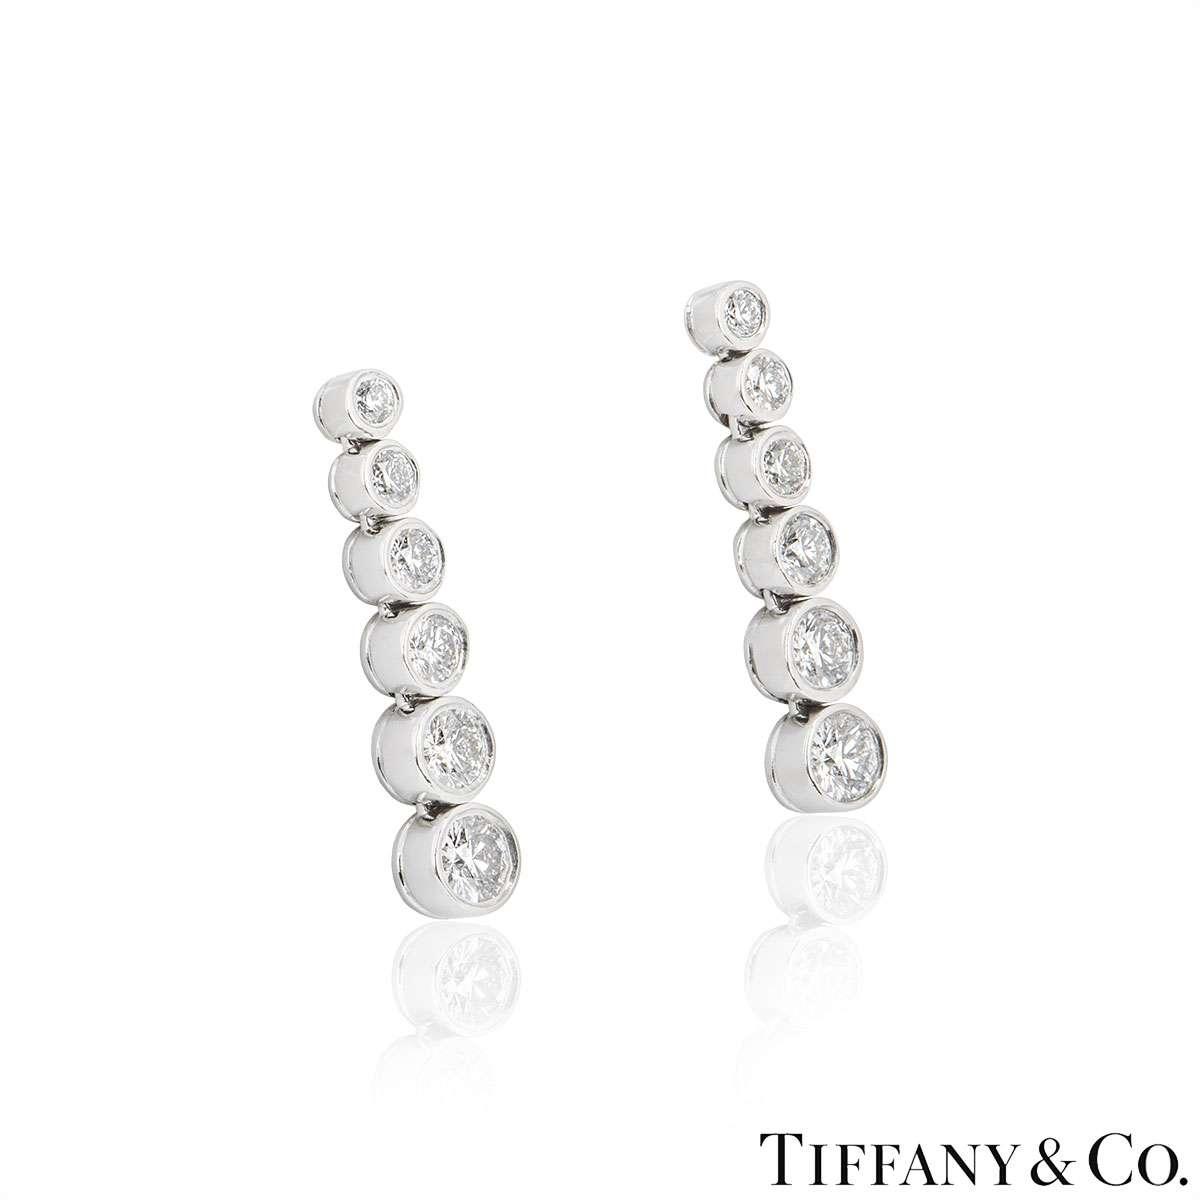 Tiffany & Co. Platinum Jazz Diamond Earrings